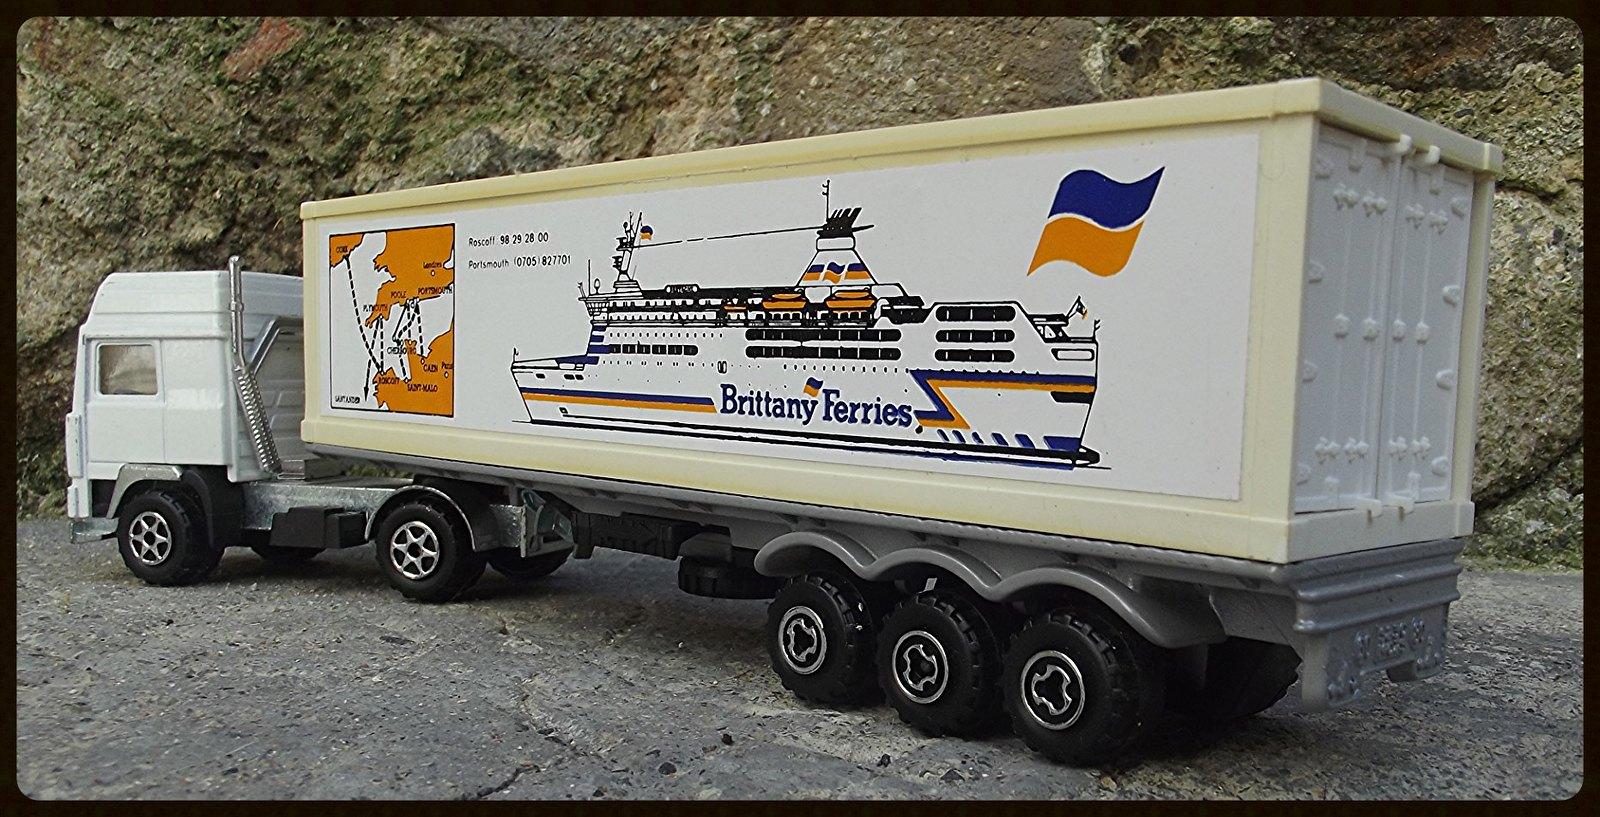 Brittany ferries /truckline ferries. 15182194168_3e304b6675_h